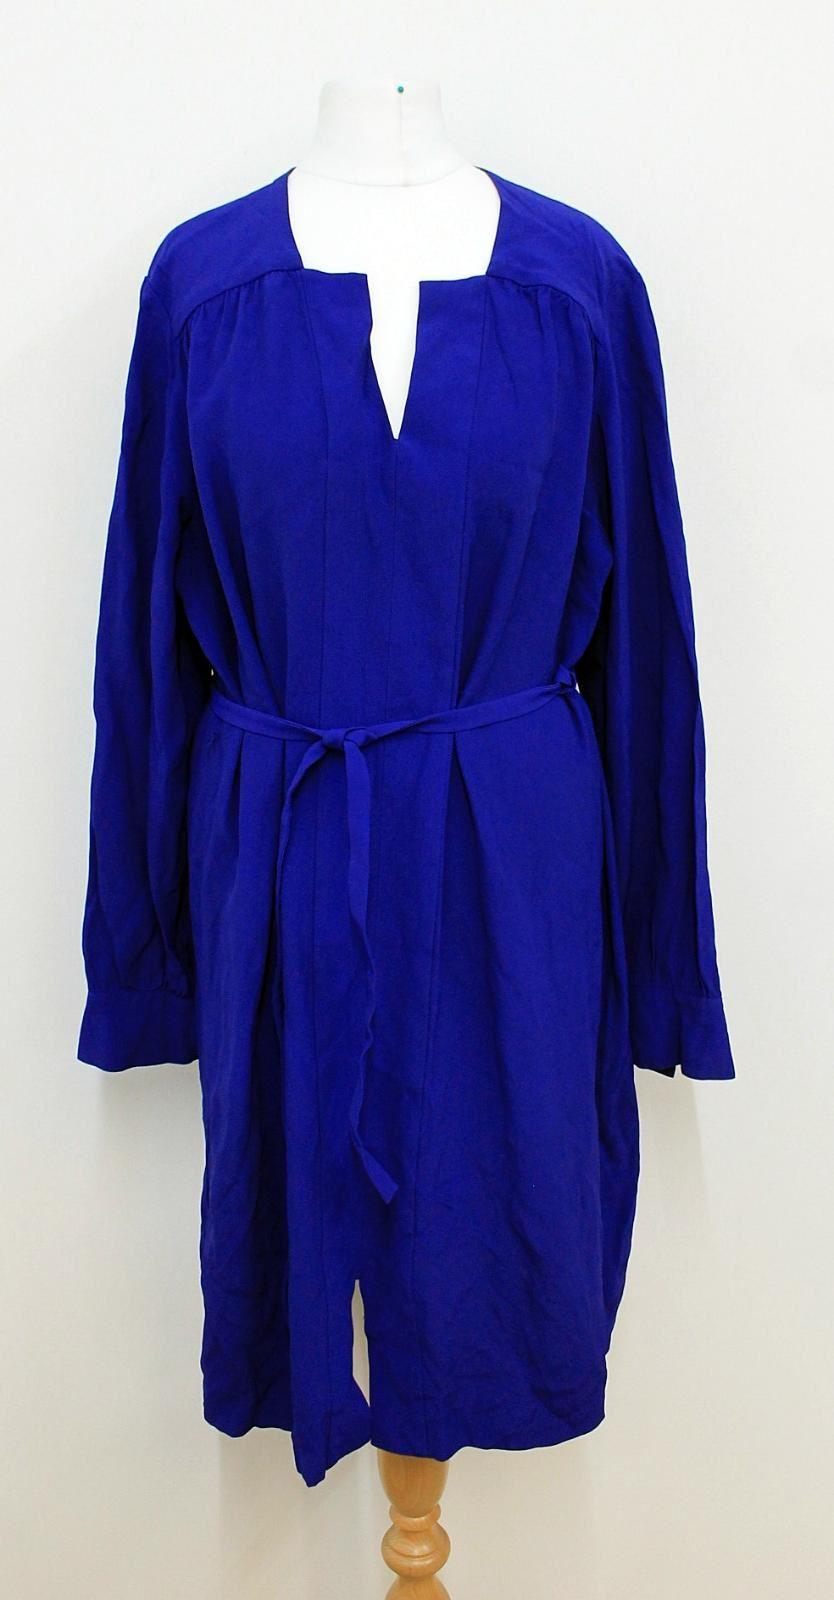 L-K-BENNETT-Ladies-Navy-Blue-Indigo-Long-Sleeved-V-Neckline-Dress-Size-UK12